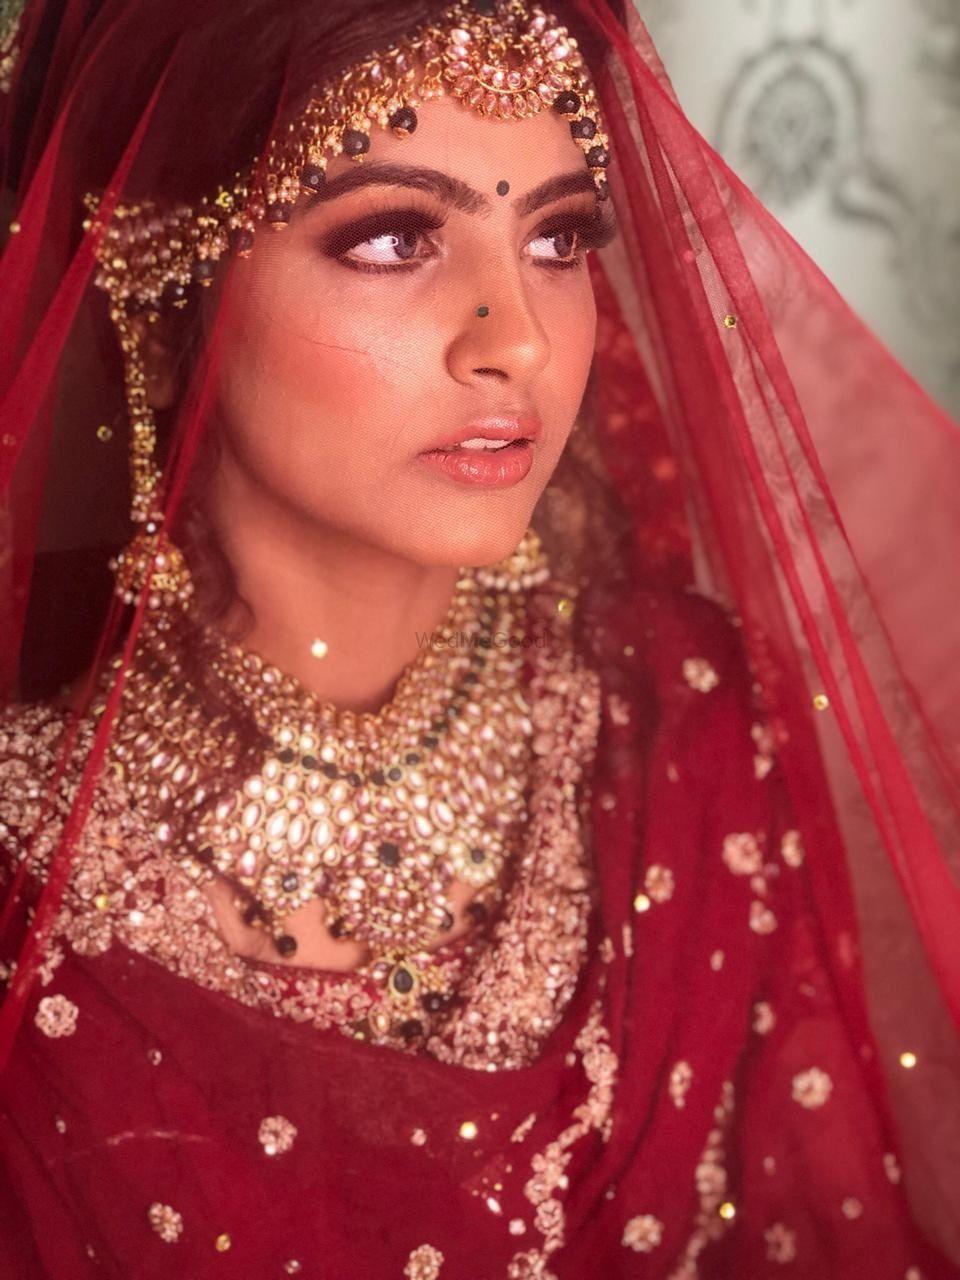 Photo From Beautiful Muslim Bride Husna ❤️ - By Aarti Makker